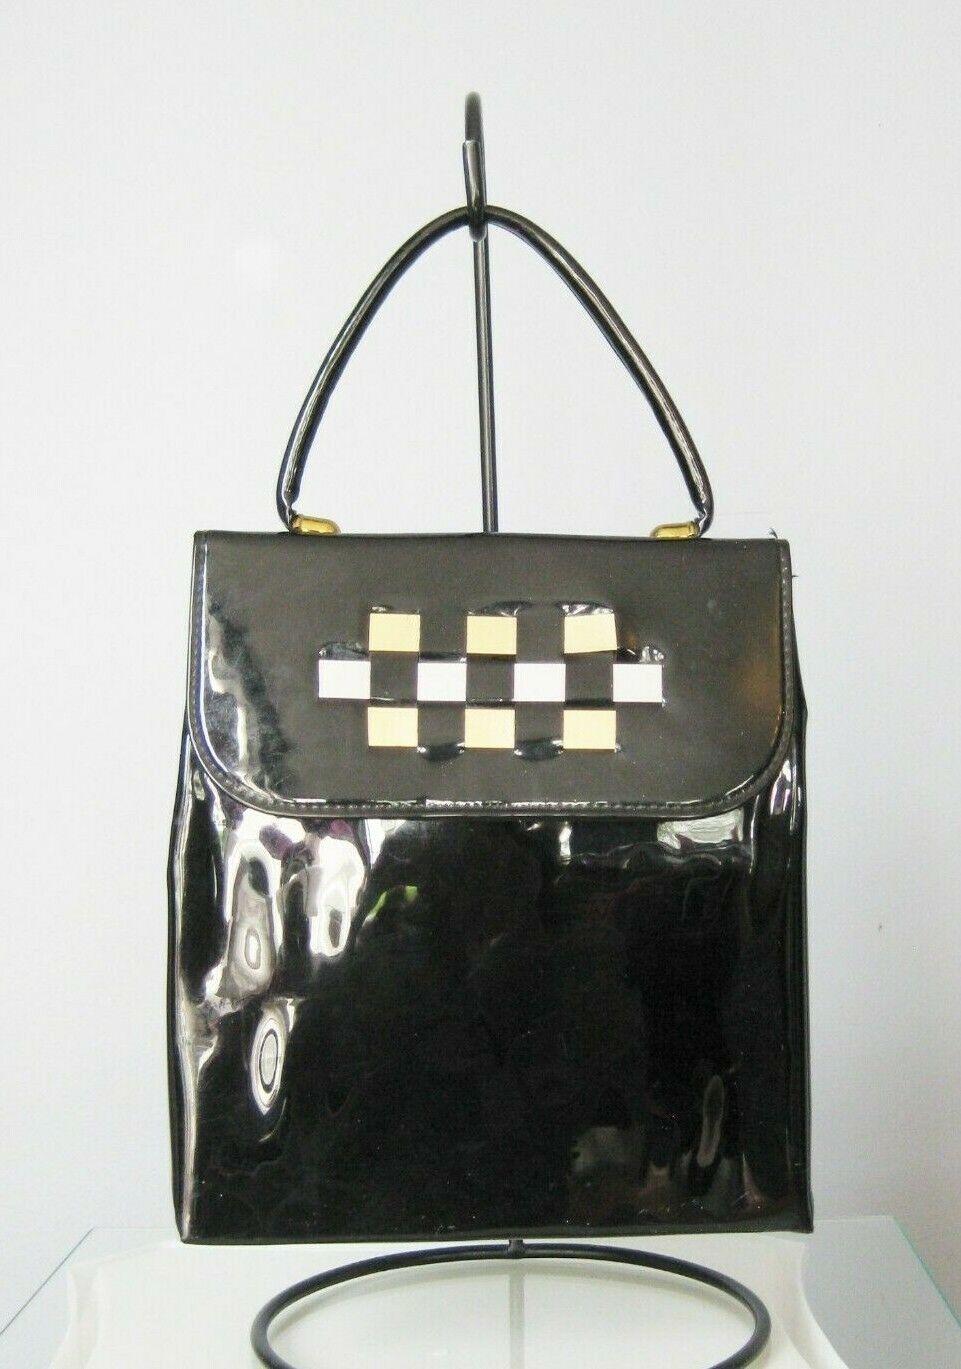 Vintage Patent Leather Top HandBag Black North South Slim Purse